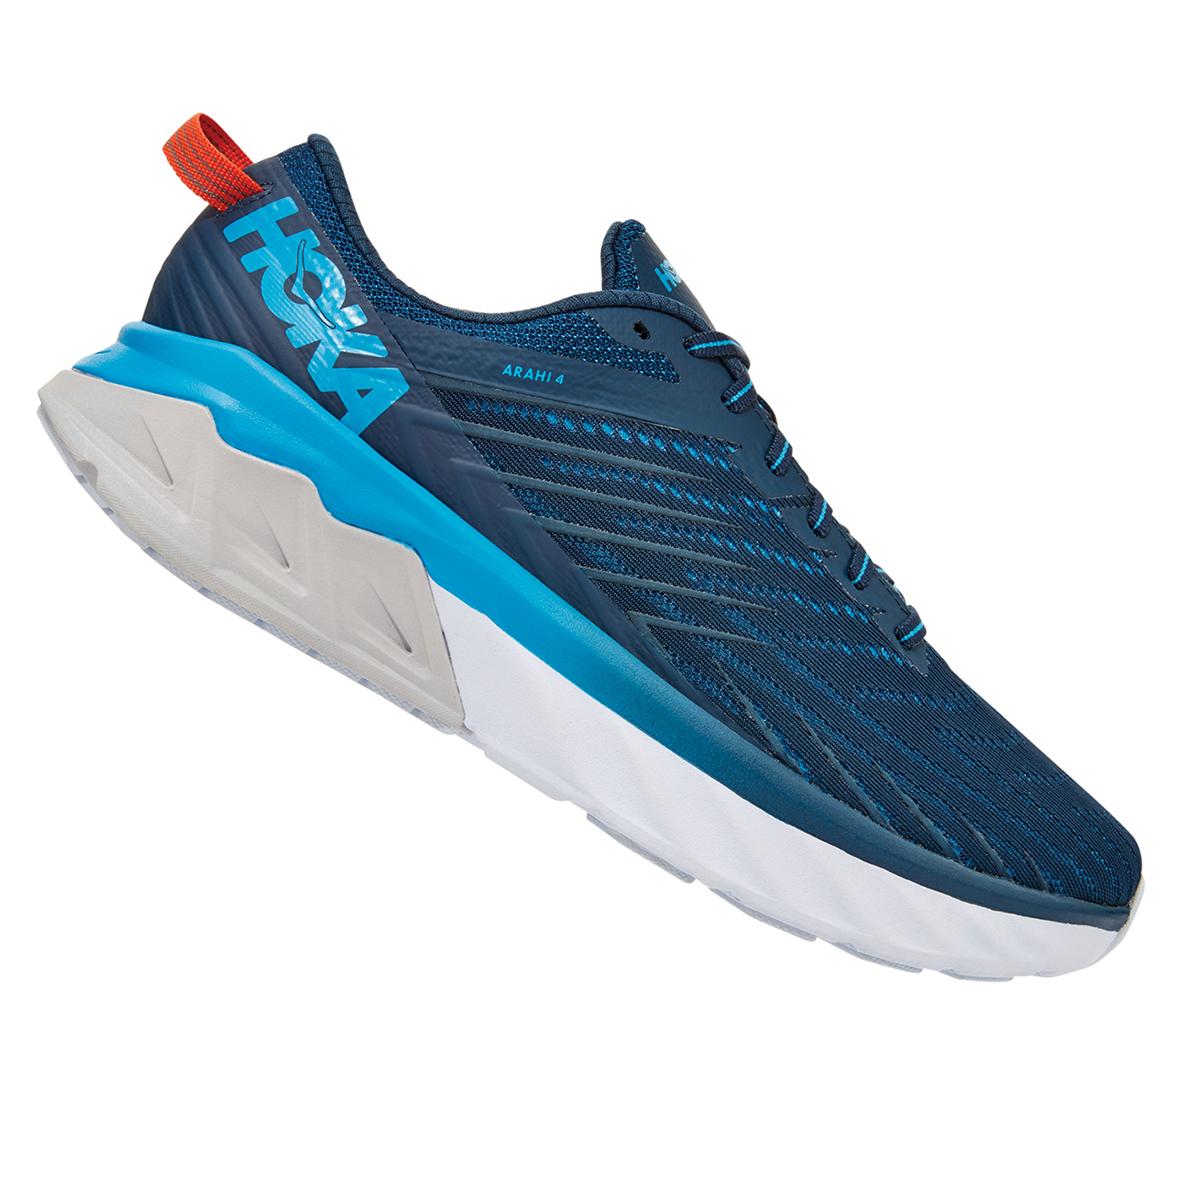 Men's Hoka One One Arahi 4 Running Shoe - Color: Majolica Blue/Dresden Blue (Regular Width) - Size: 7, Majolica Blue/Dresden Blue, large, image 3